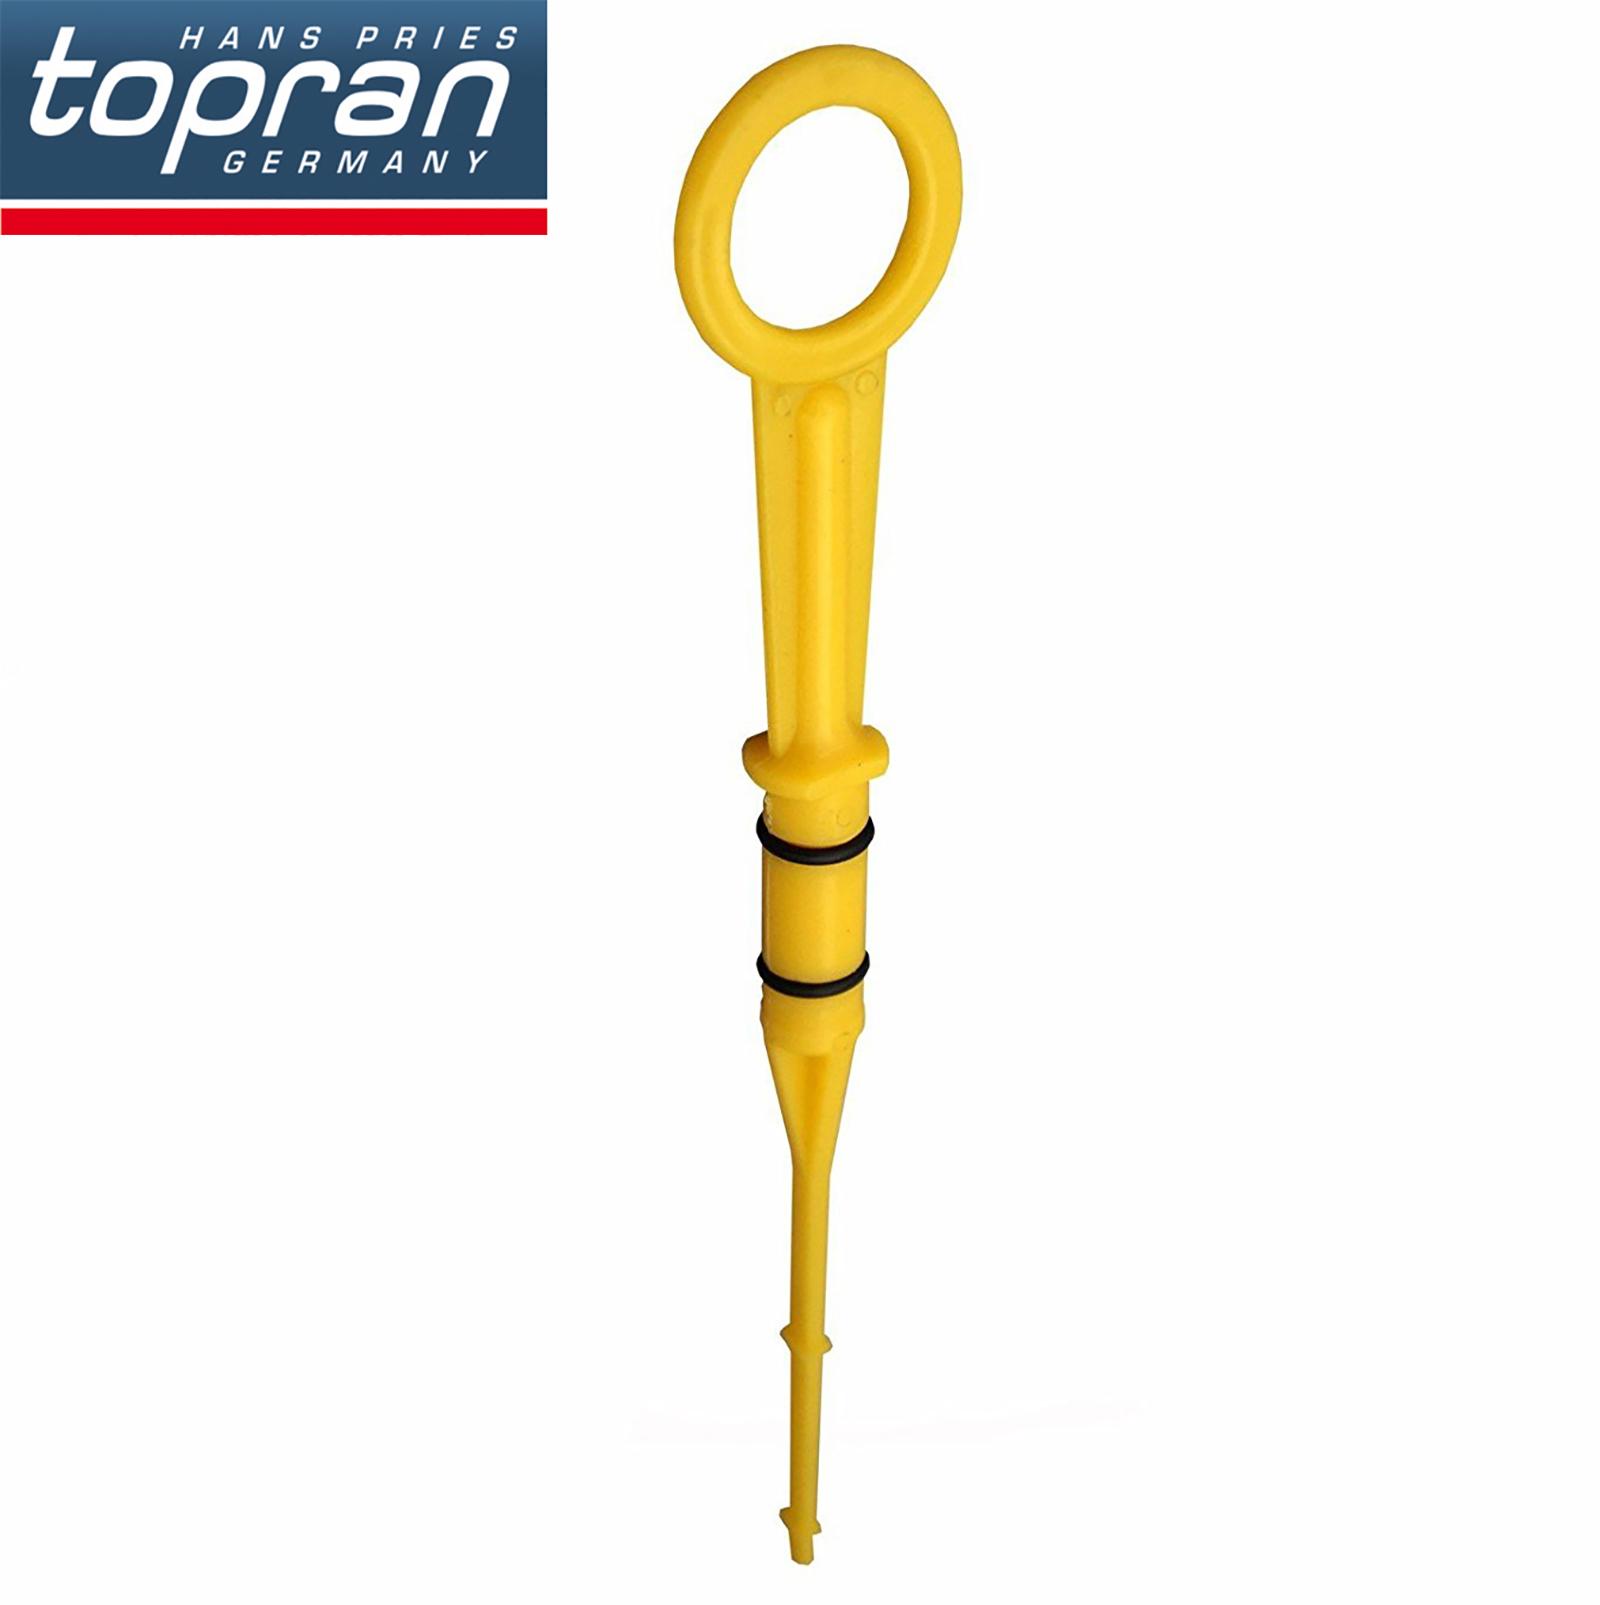 Renault Scenic 1.4 1.6 16V Engine Oil Dipstick Stick Level Measurer Short 220m